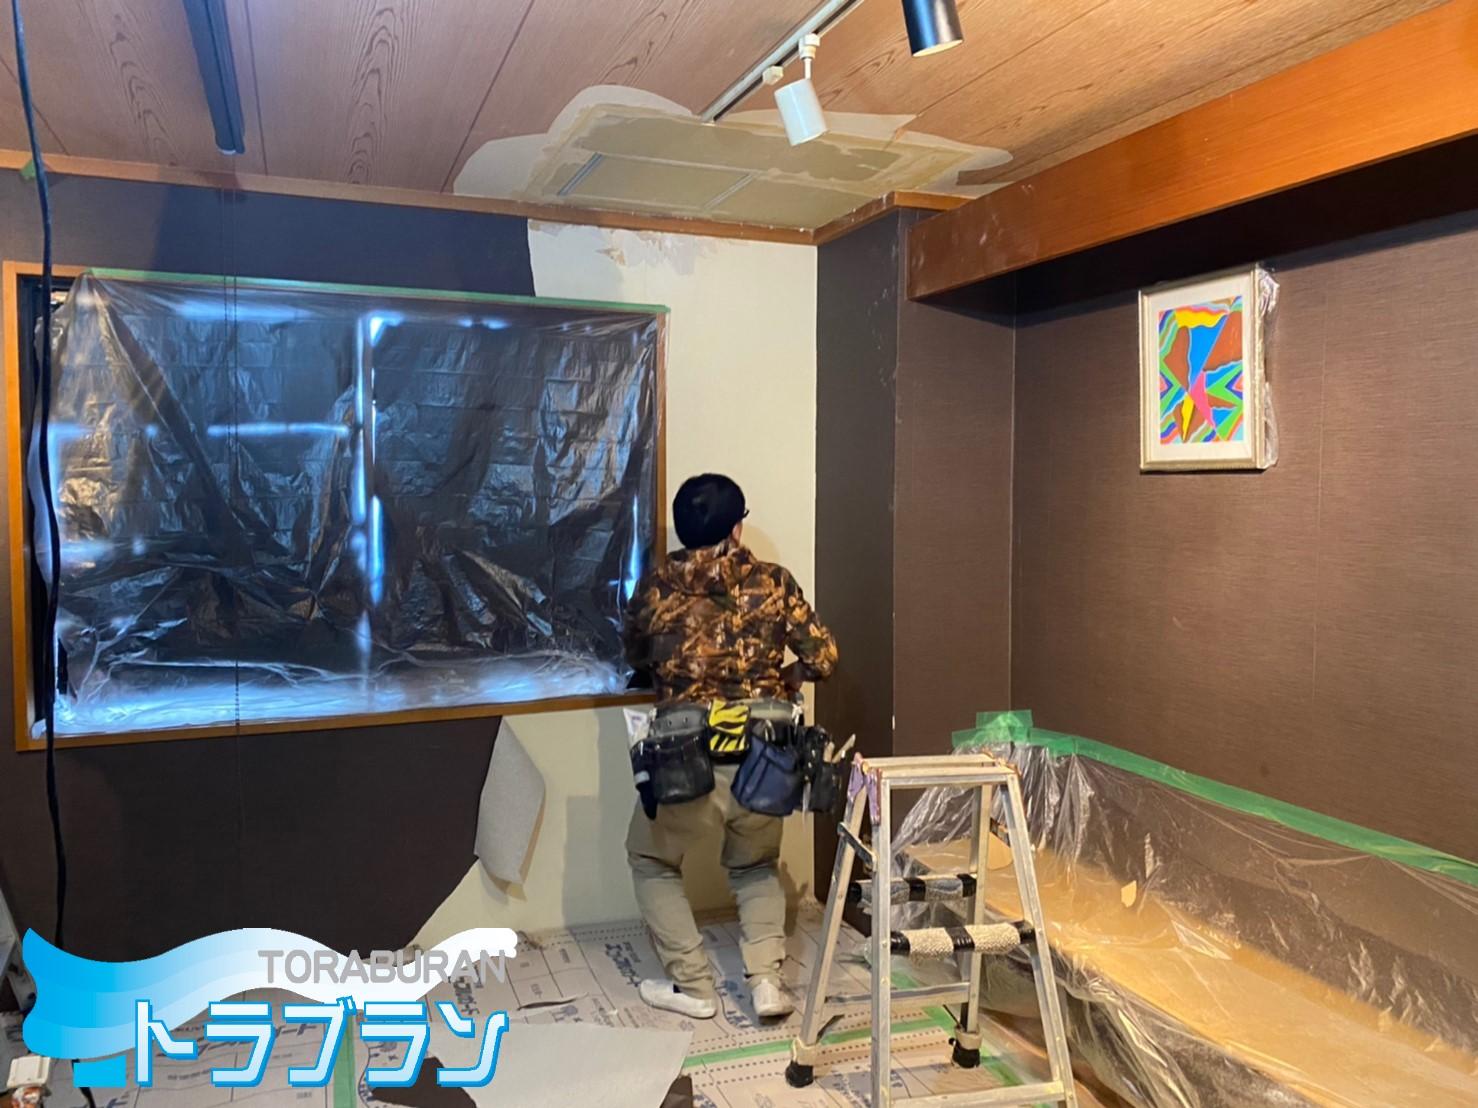 台風被害 内装工事 漏水工事 保険適用 神戸市 トラブラン